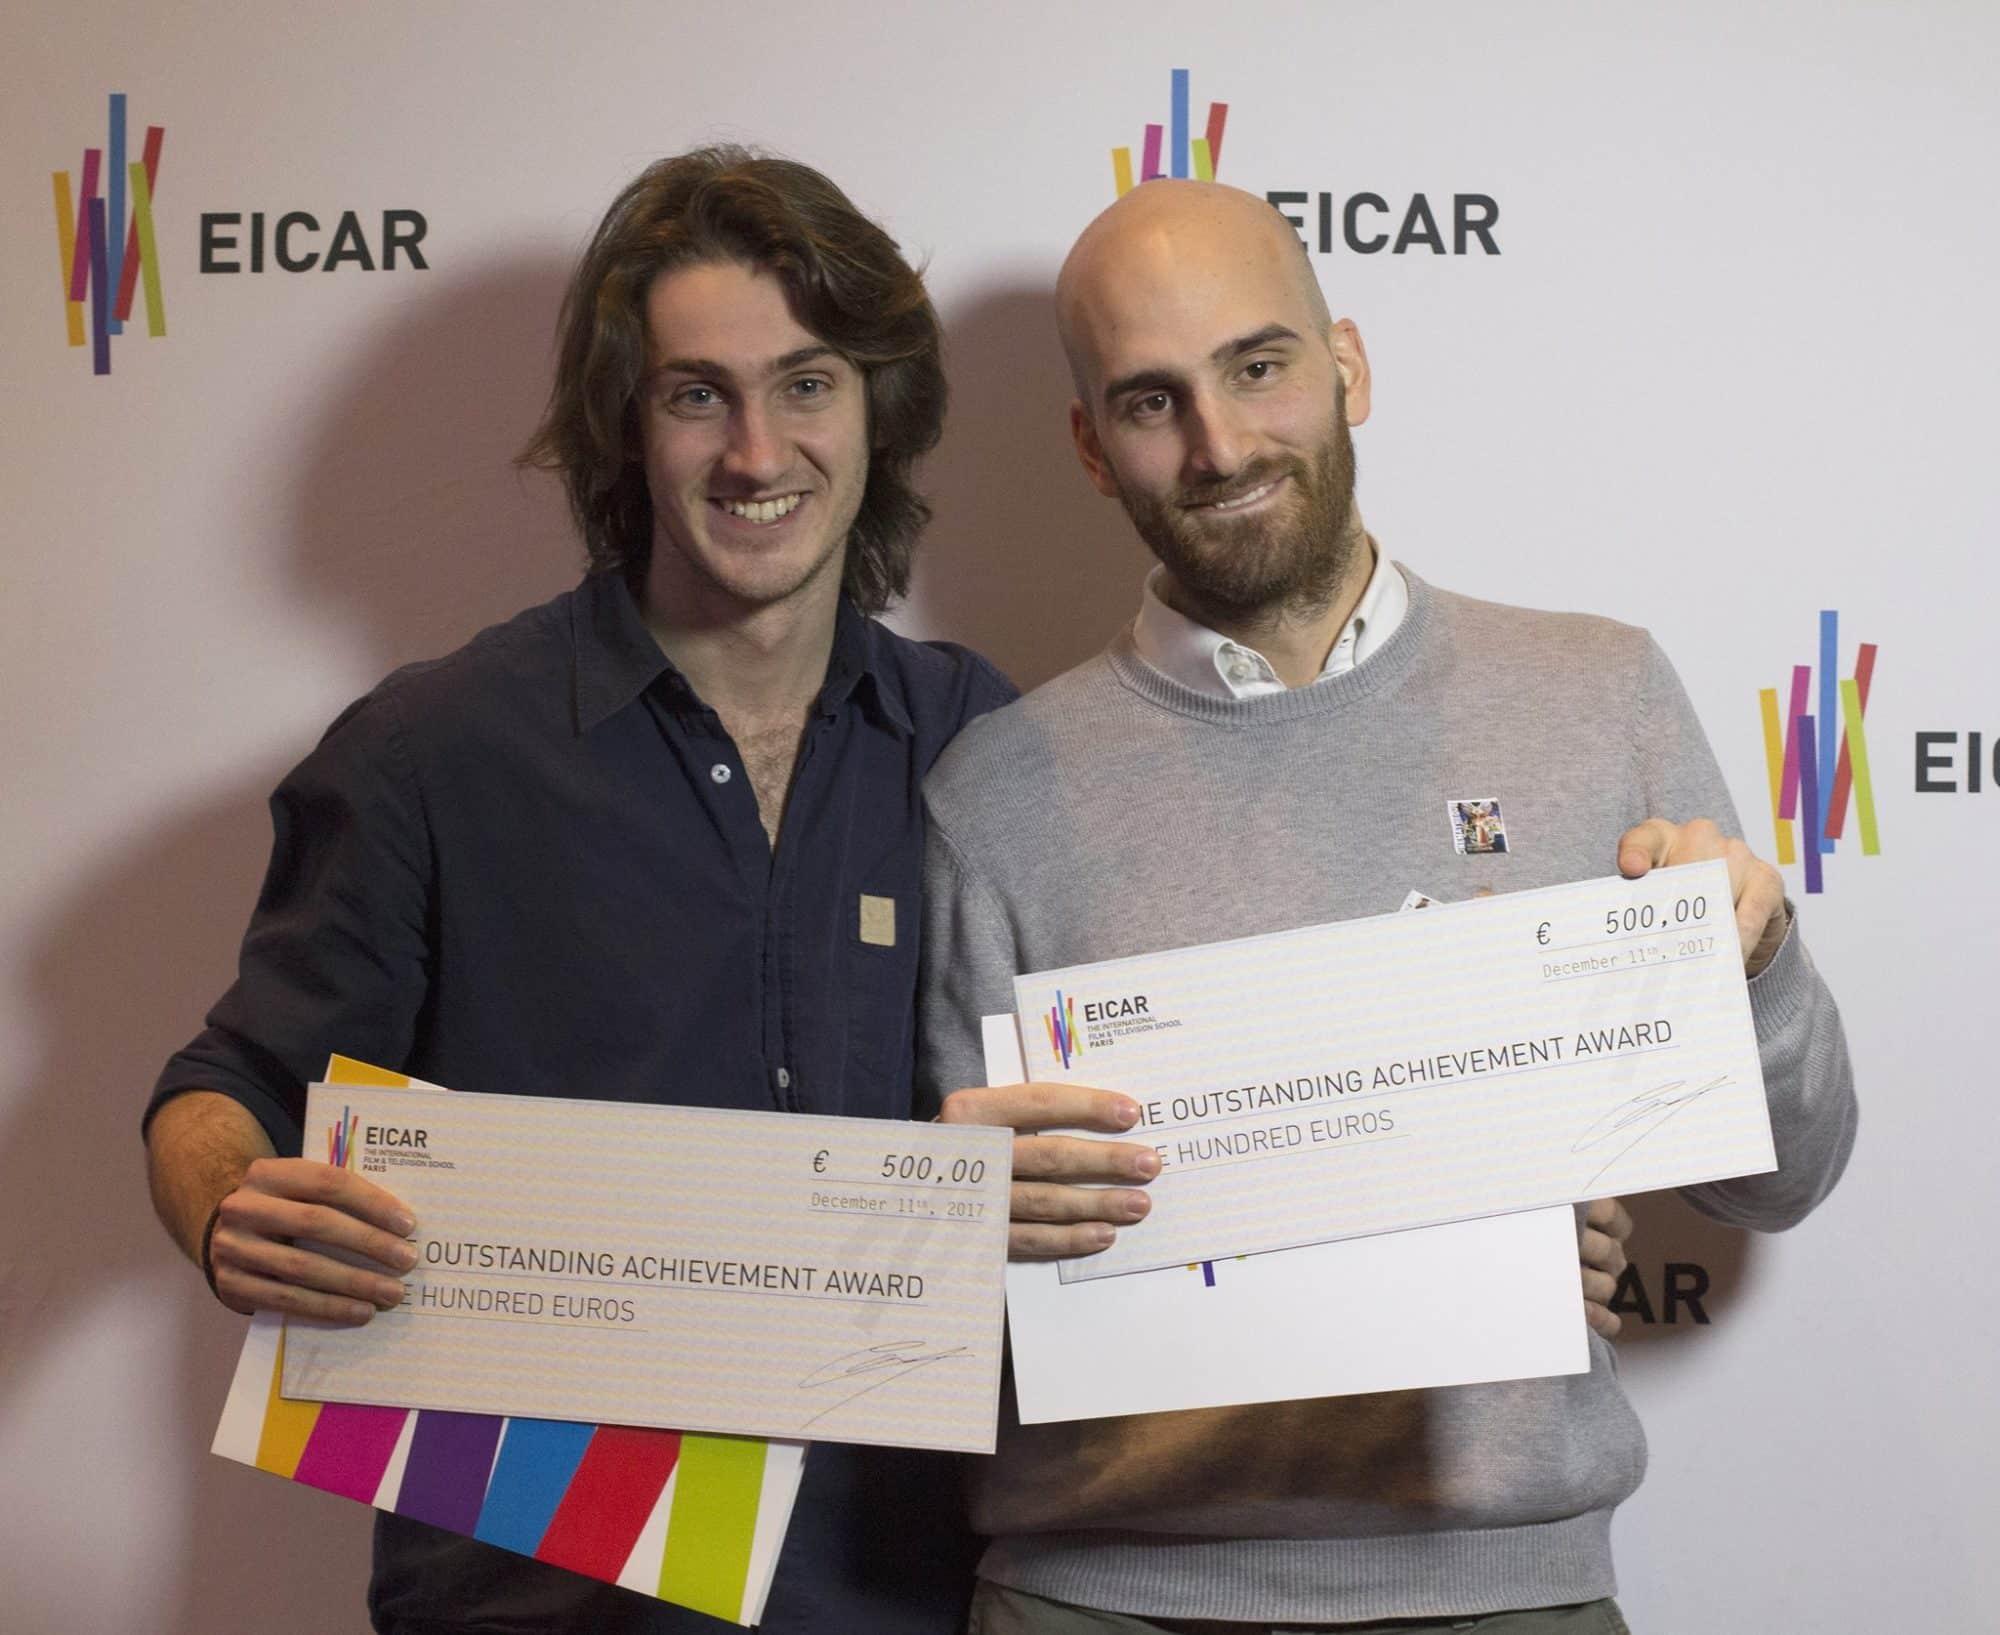 EICAR International Department Film Competition - Outstanding Achievement Awards